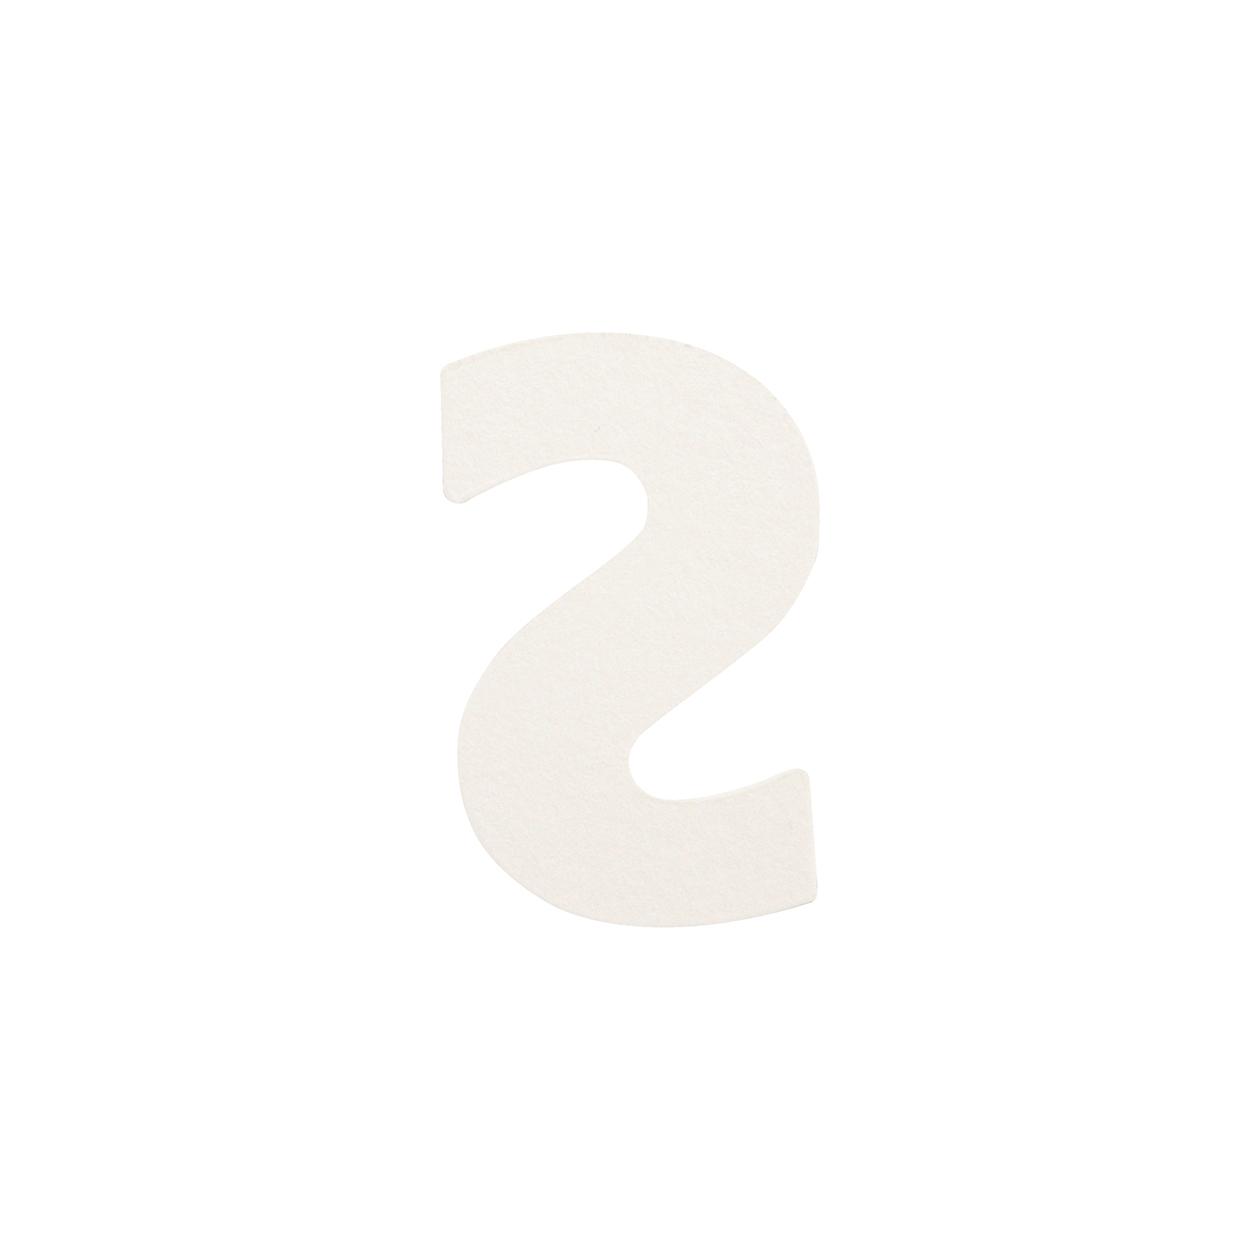 No.395ボード A7カードDC 文字S シルバー